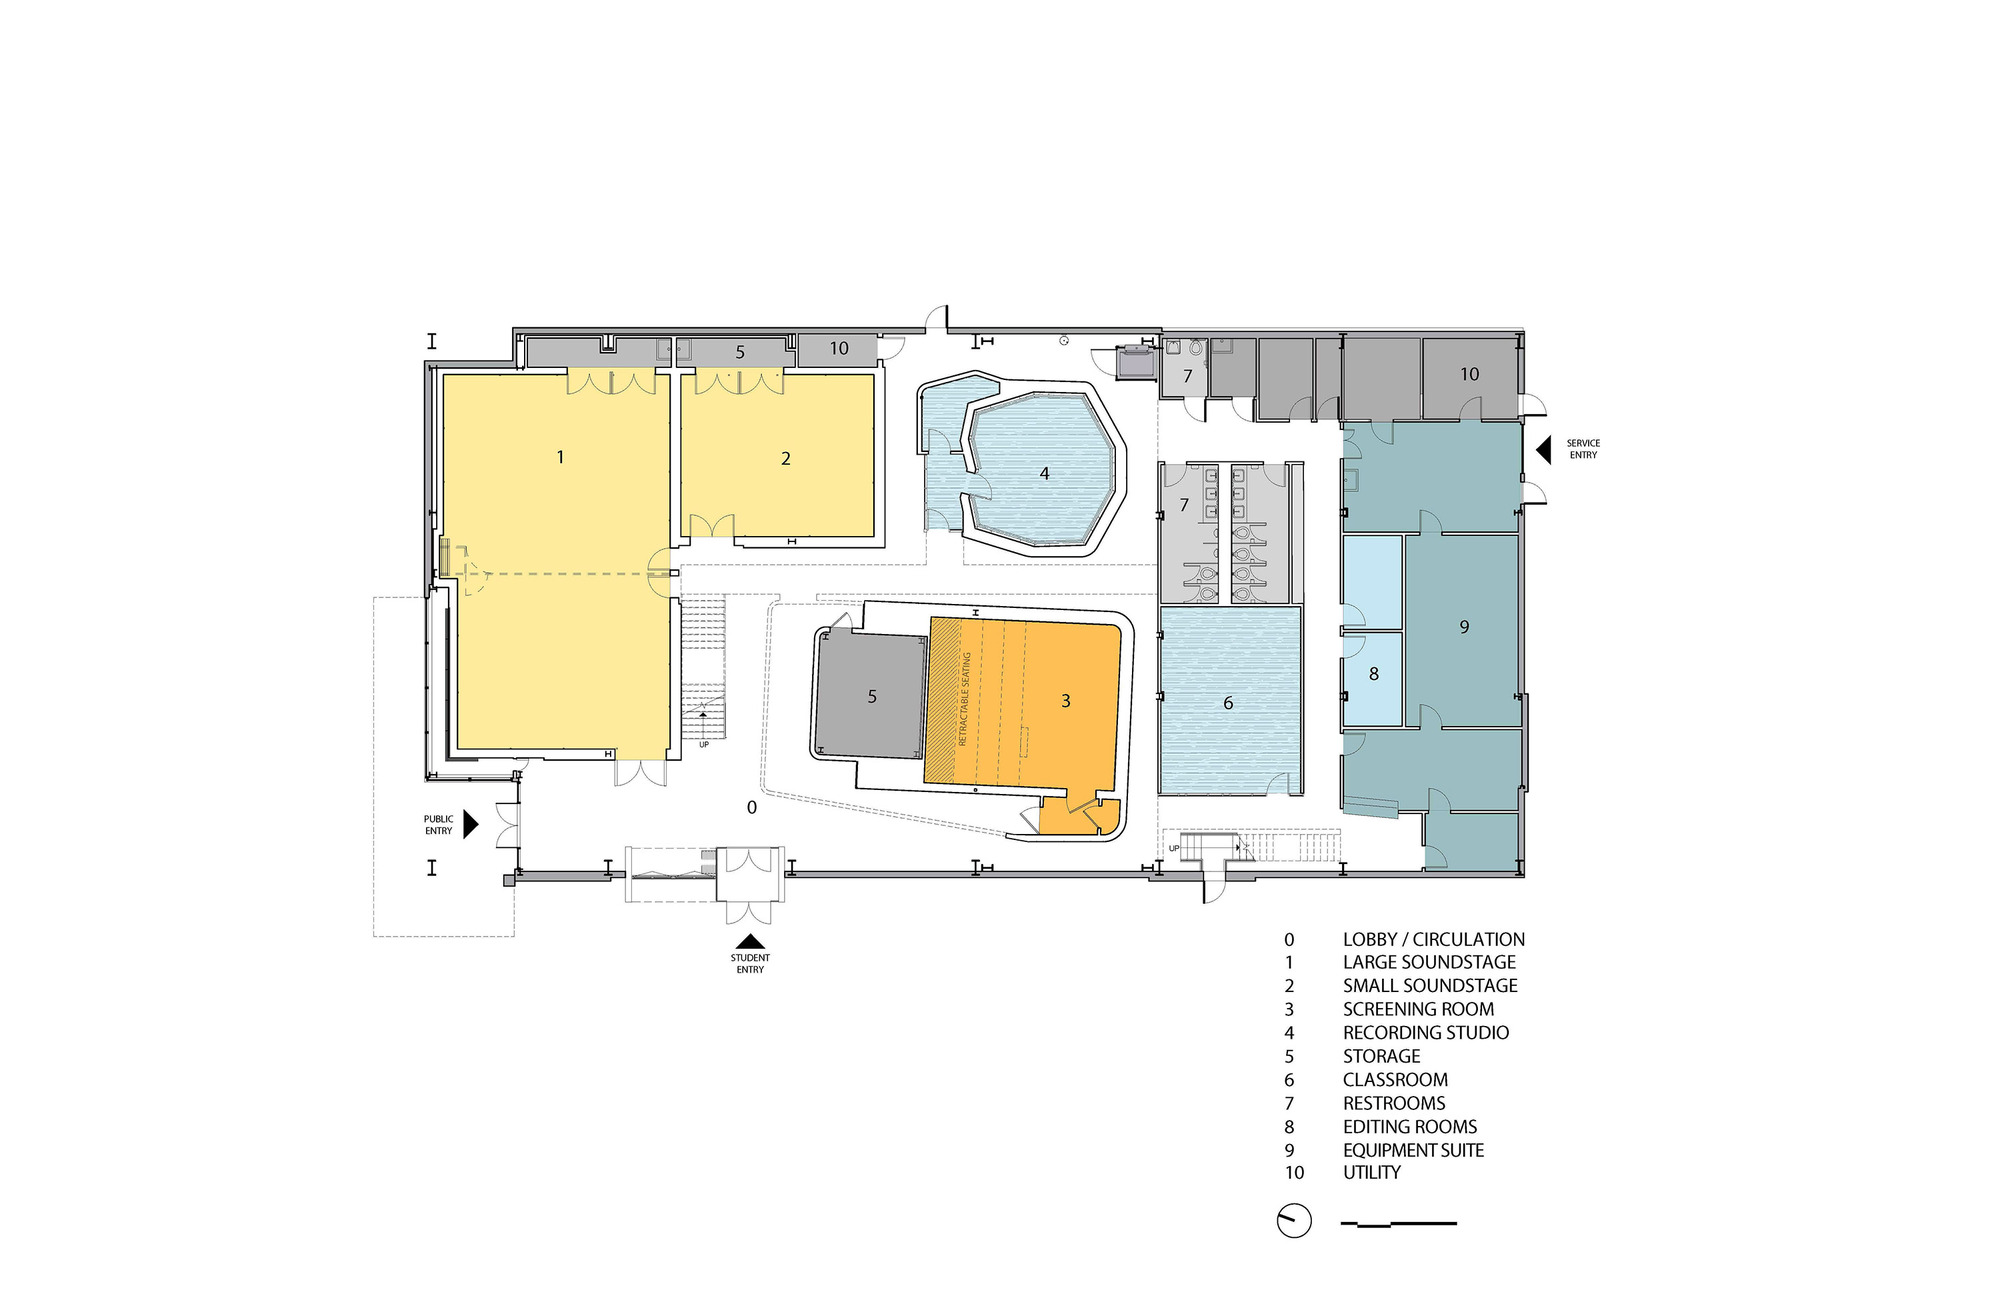 55a9a076e58ece12db000163 Pratt Institutes New Film Video Department Building Wasa Studio A Ground Floor Plan on Small Building Floor Plans